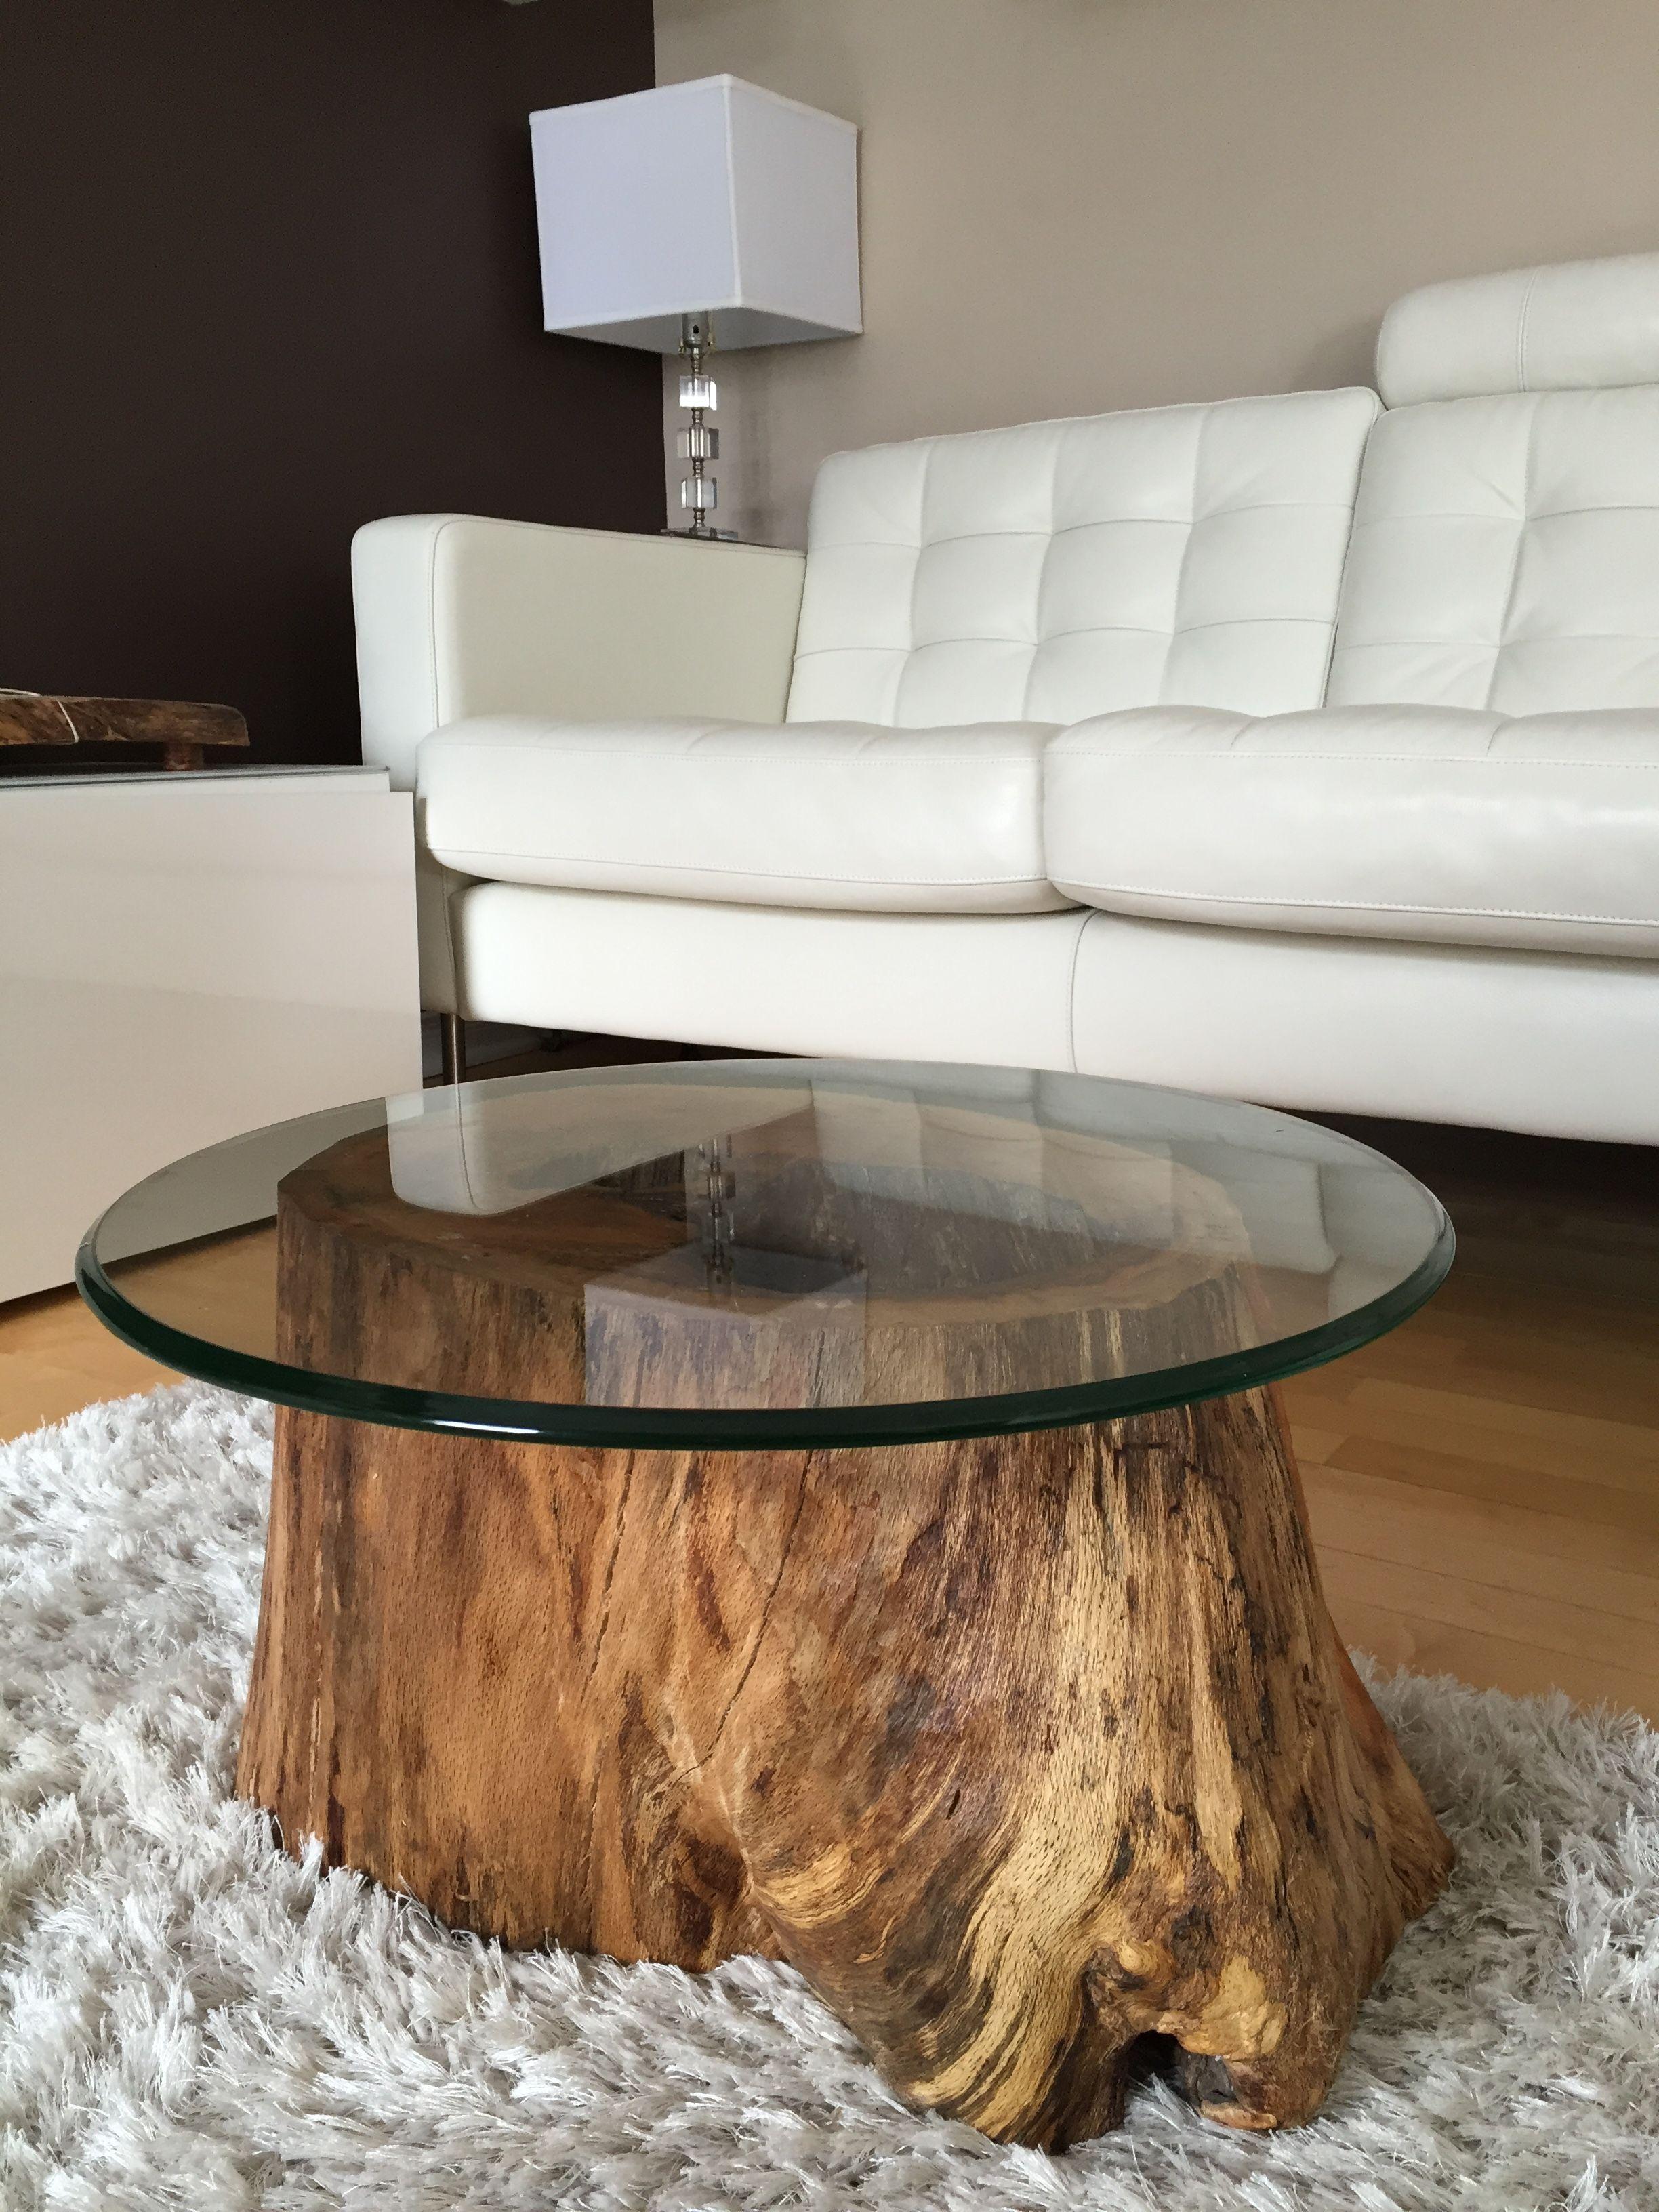 Blu Dot Turn Coffee Table Collection Coffee Tables 23 12 E Coffee Table Rustic Furniture Design Diy Home Decor [ 3264 x 2448 Pixel ]